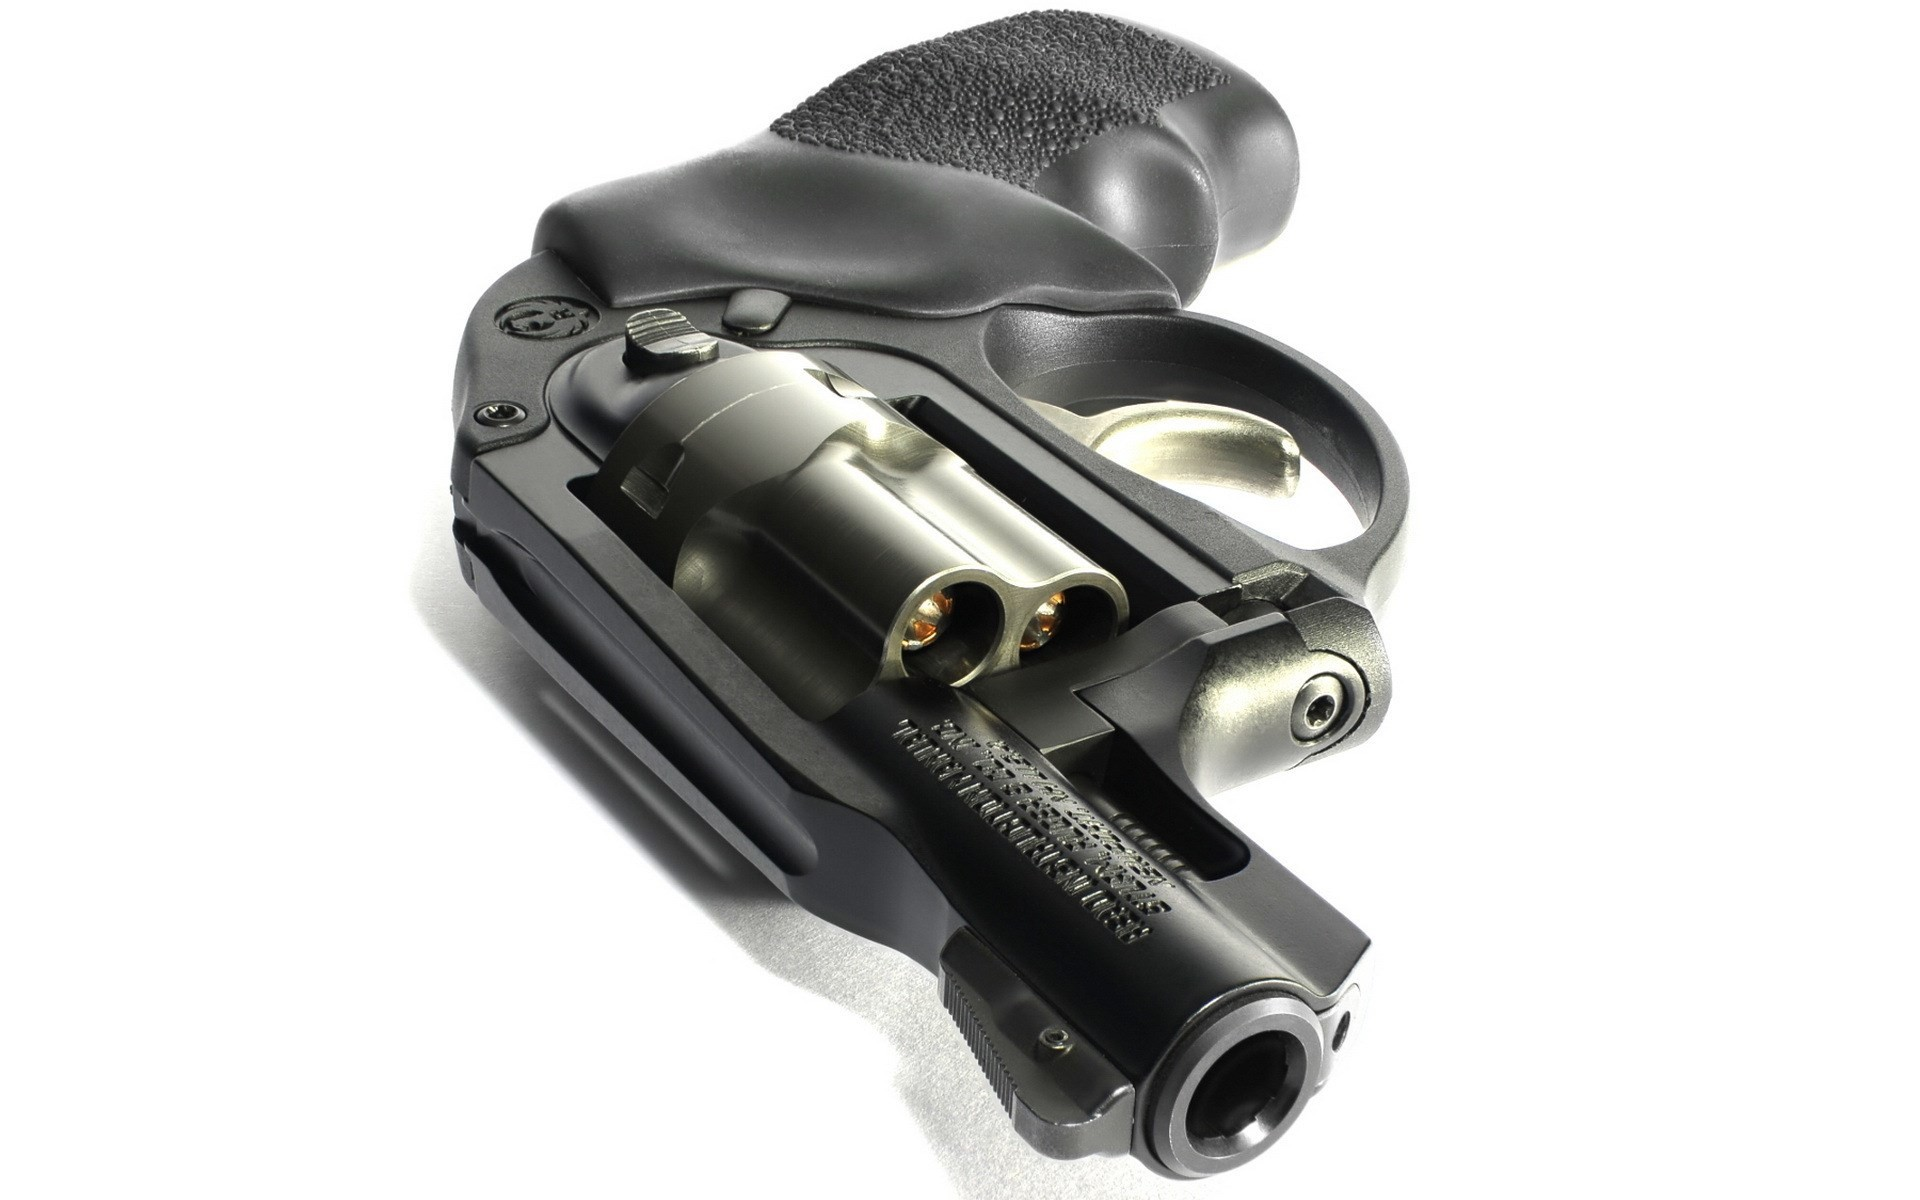 ruger revolver backround to download (Buddy Backer 1920×1200)